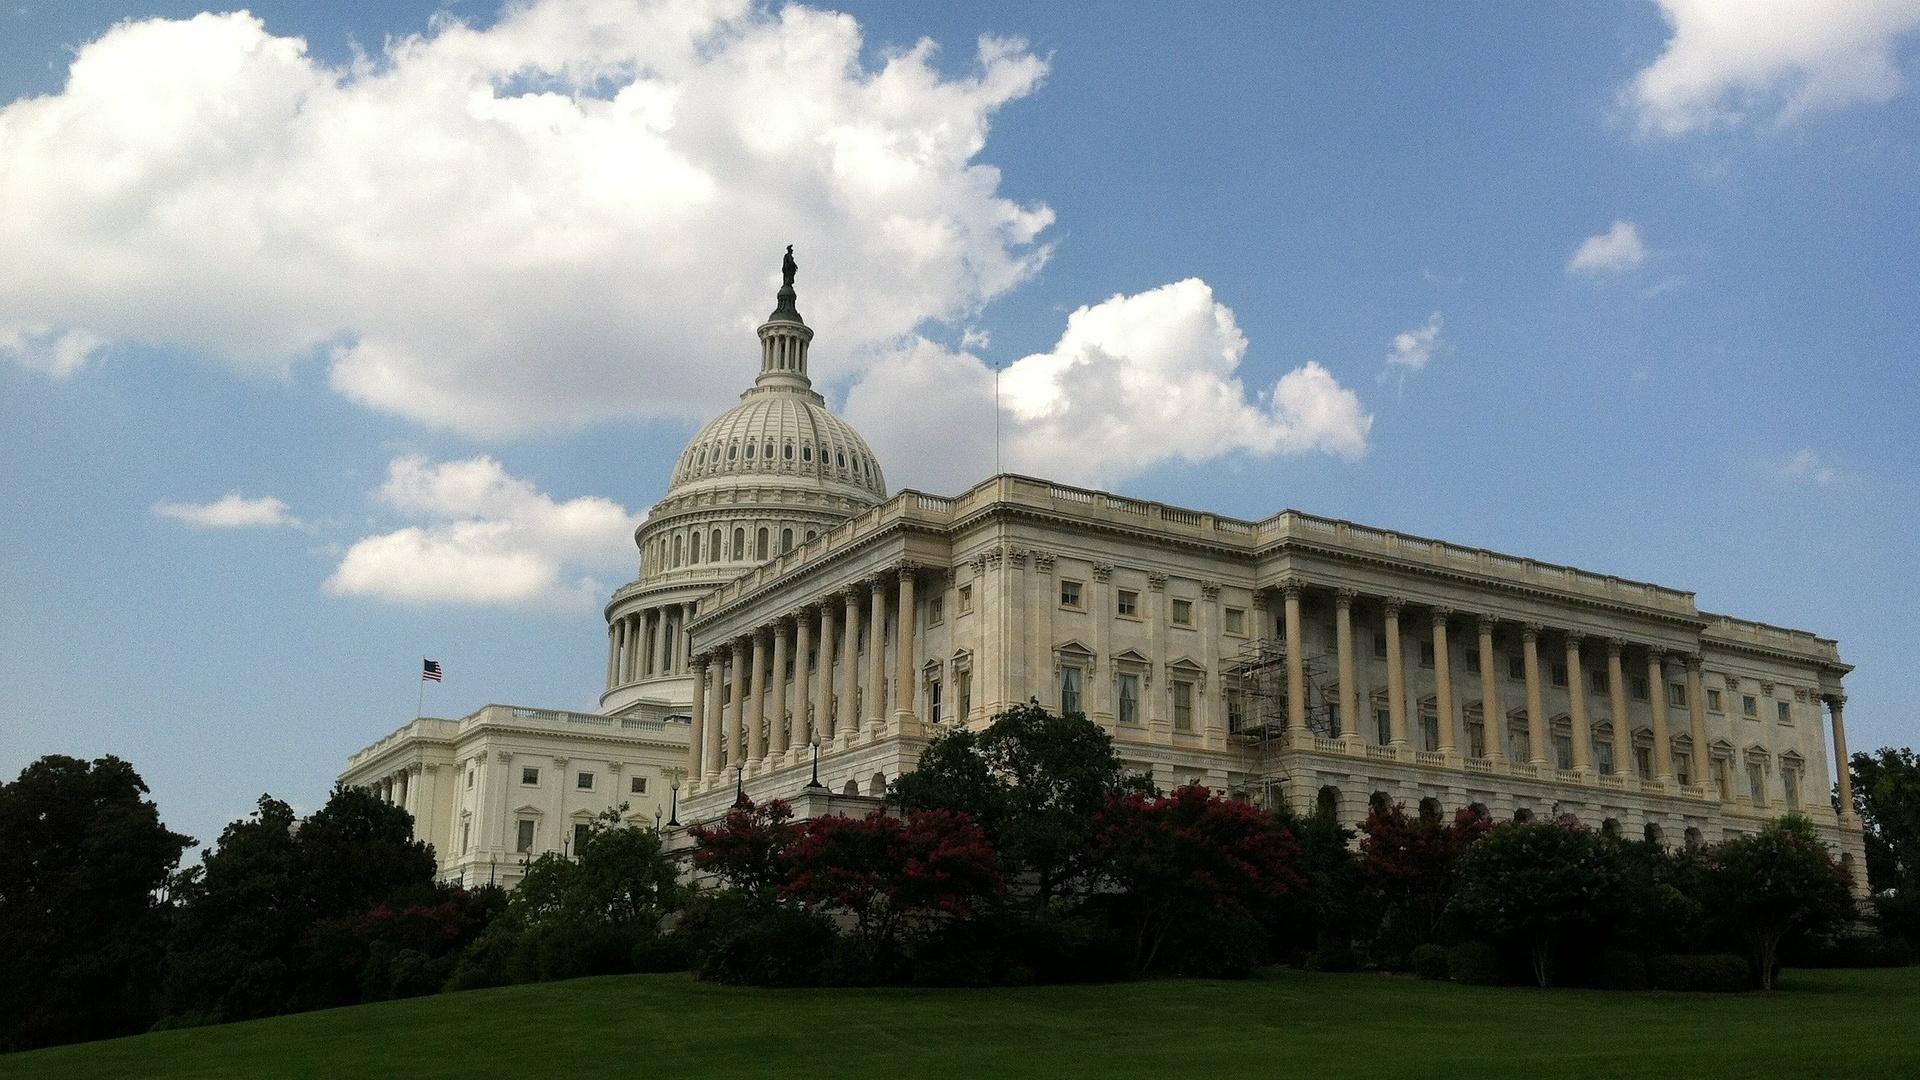 congress-321420_1920-473988-edited.jpg